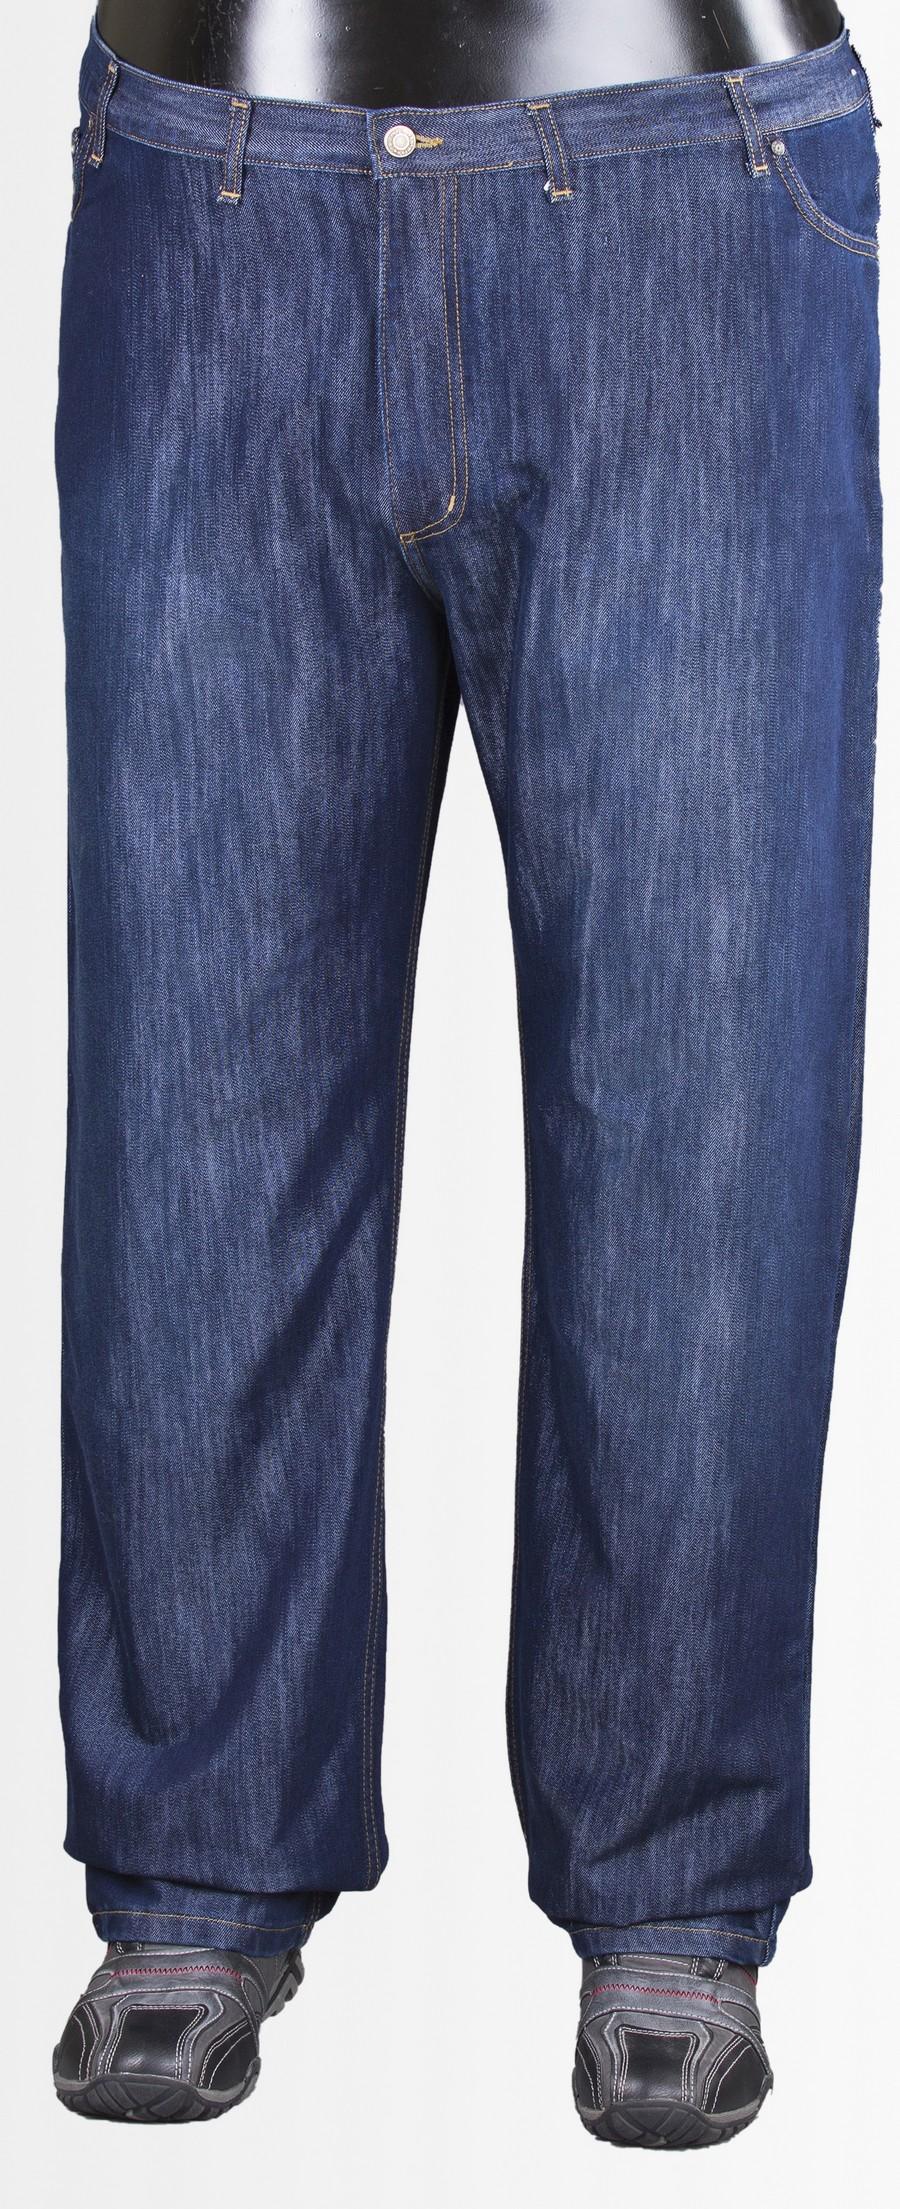 Big Men Certified spodnie 3XL 4XL 5XL 6XL 7XL 8XL